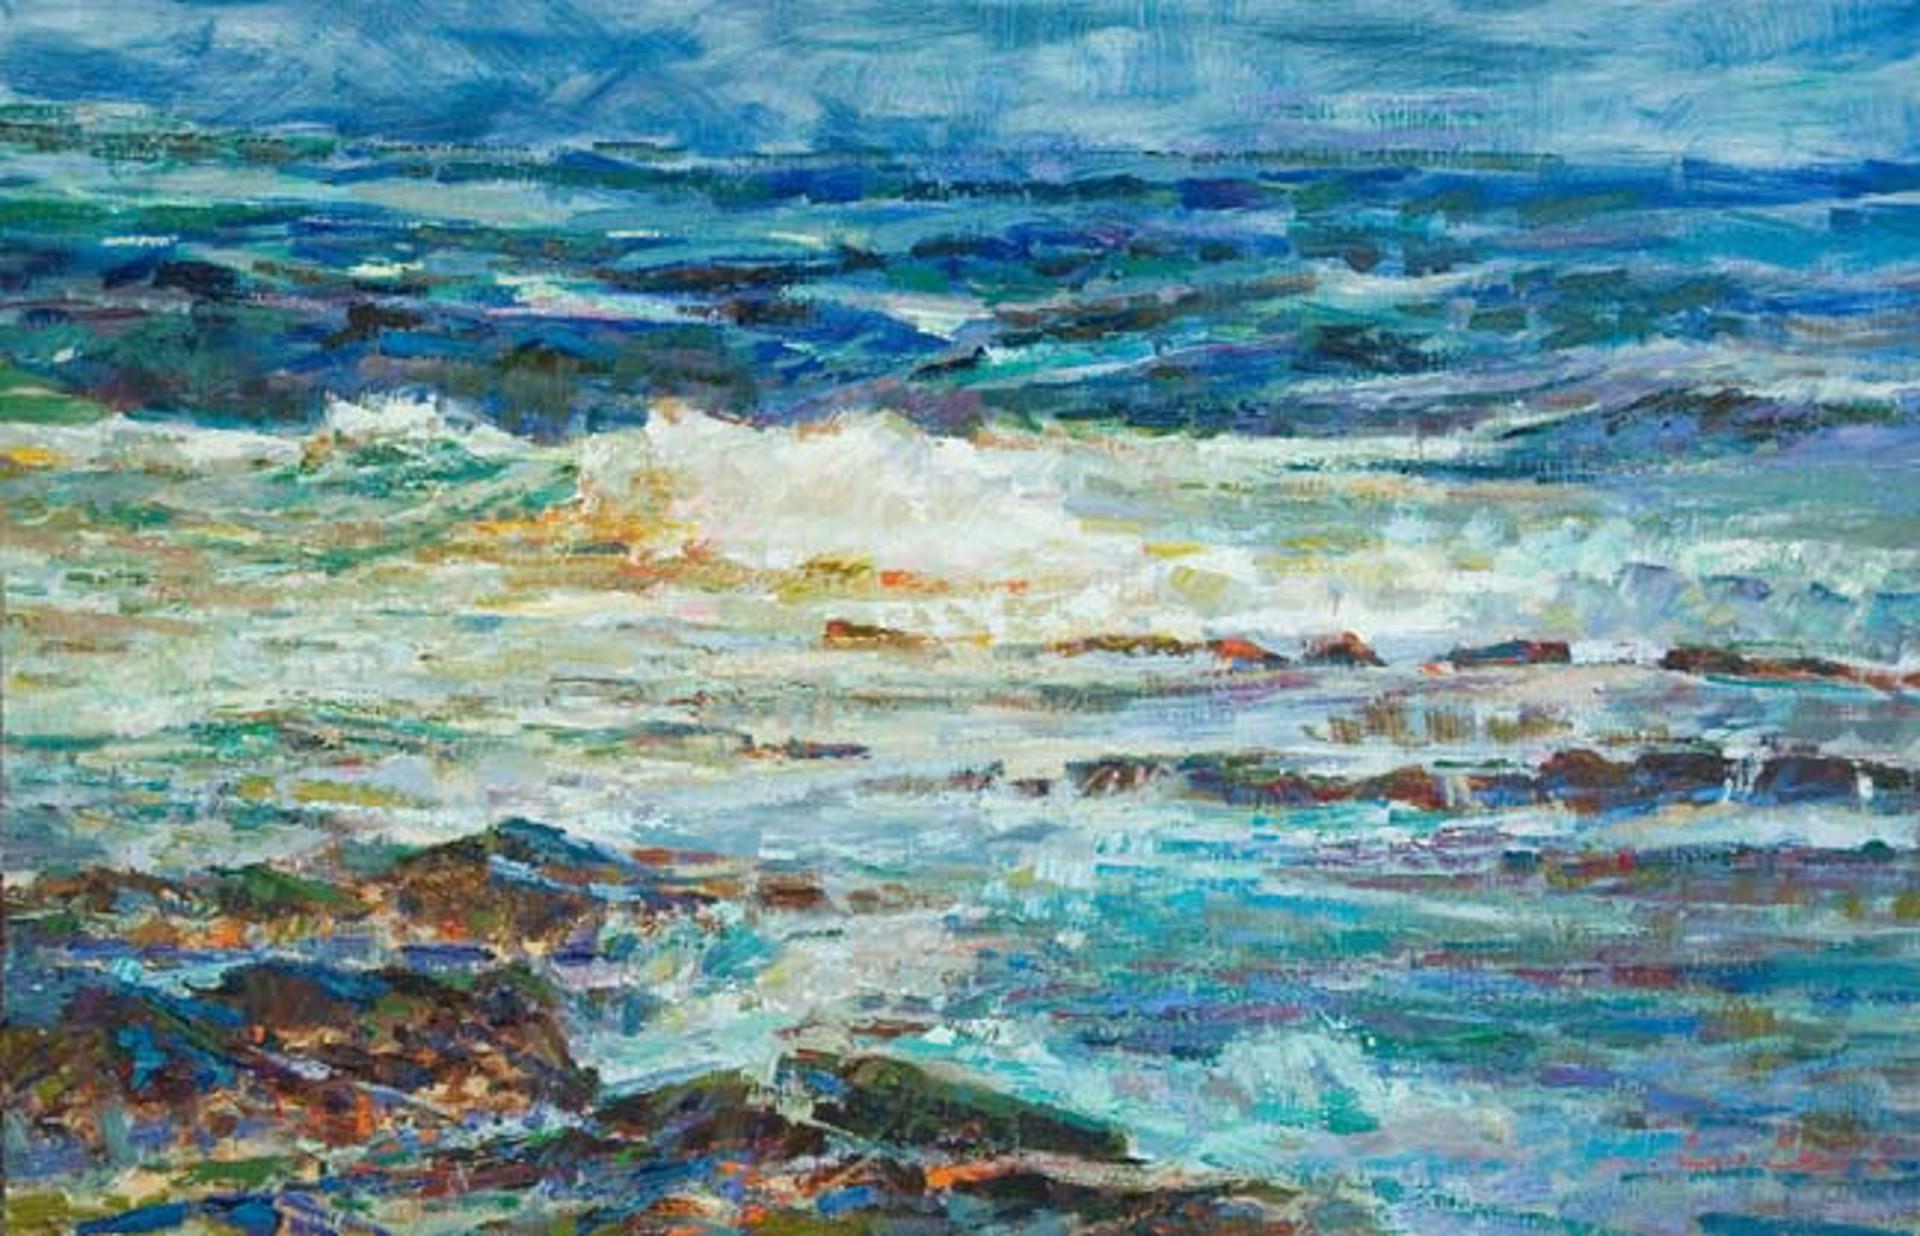 Sunset Beach by Lau Chun